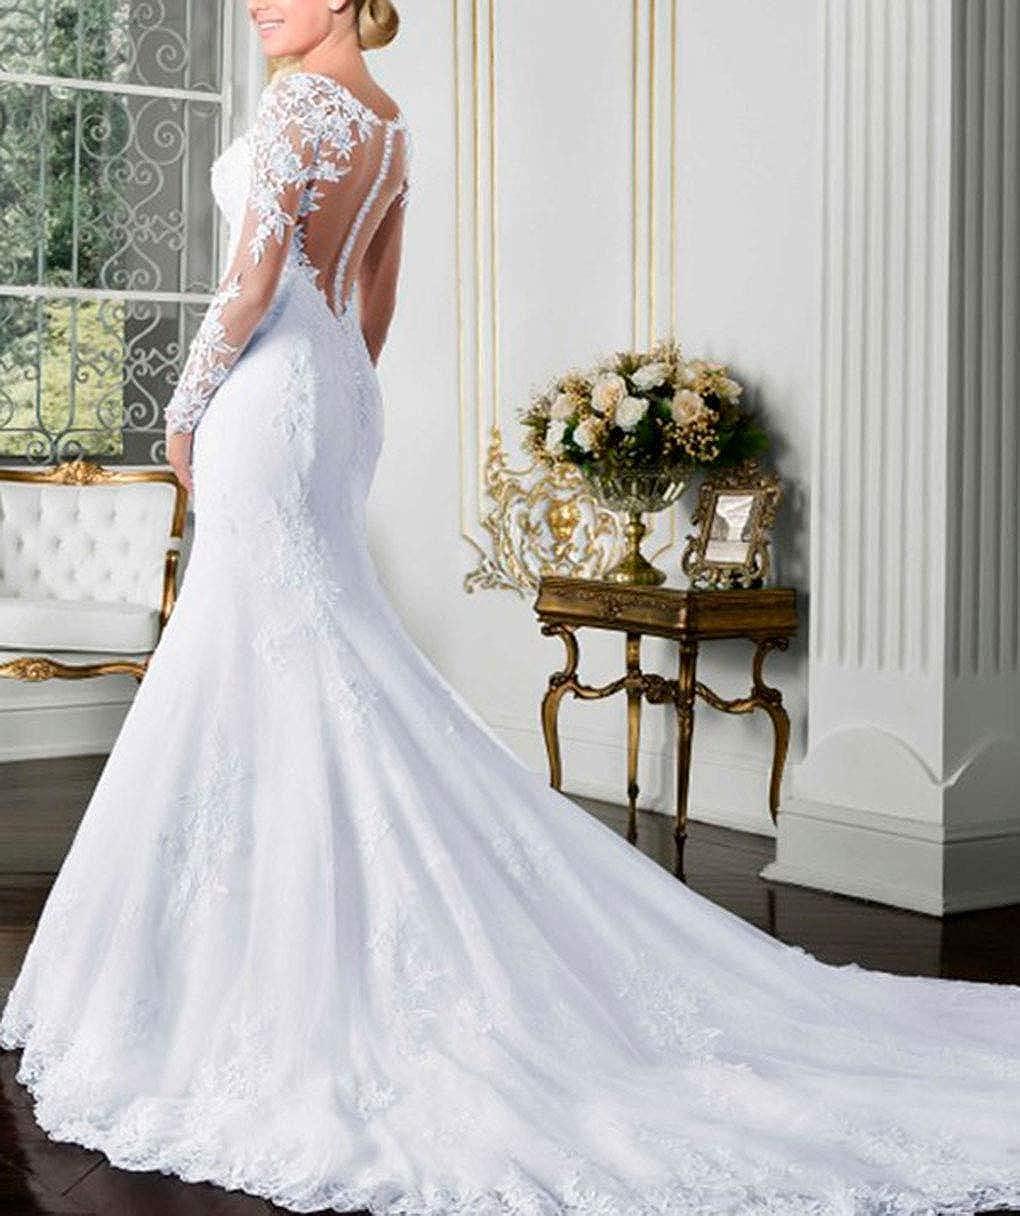 Amazon Com Fashionbride Women S Long Sleeves Mermaid Wedding Dresses 2020 See Through Back Bridal Gowns Clothing